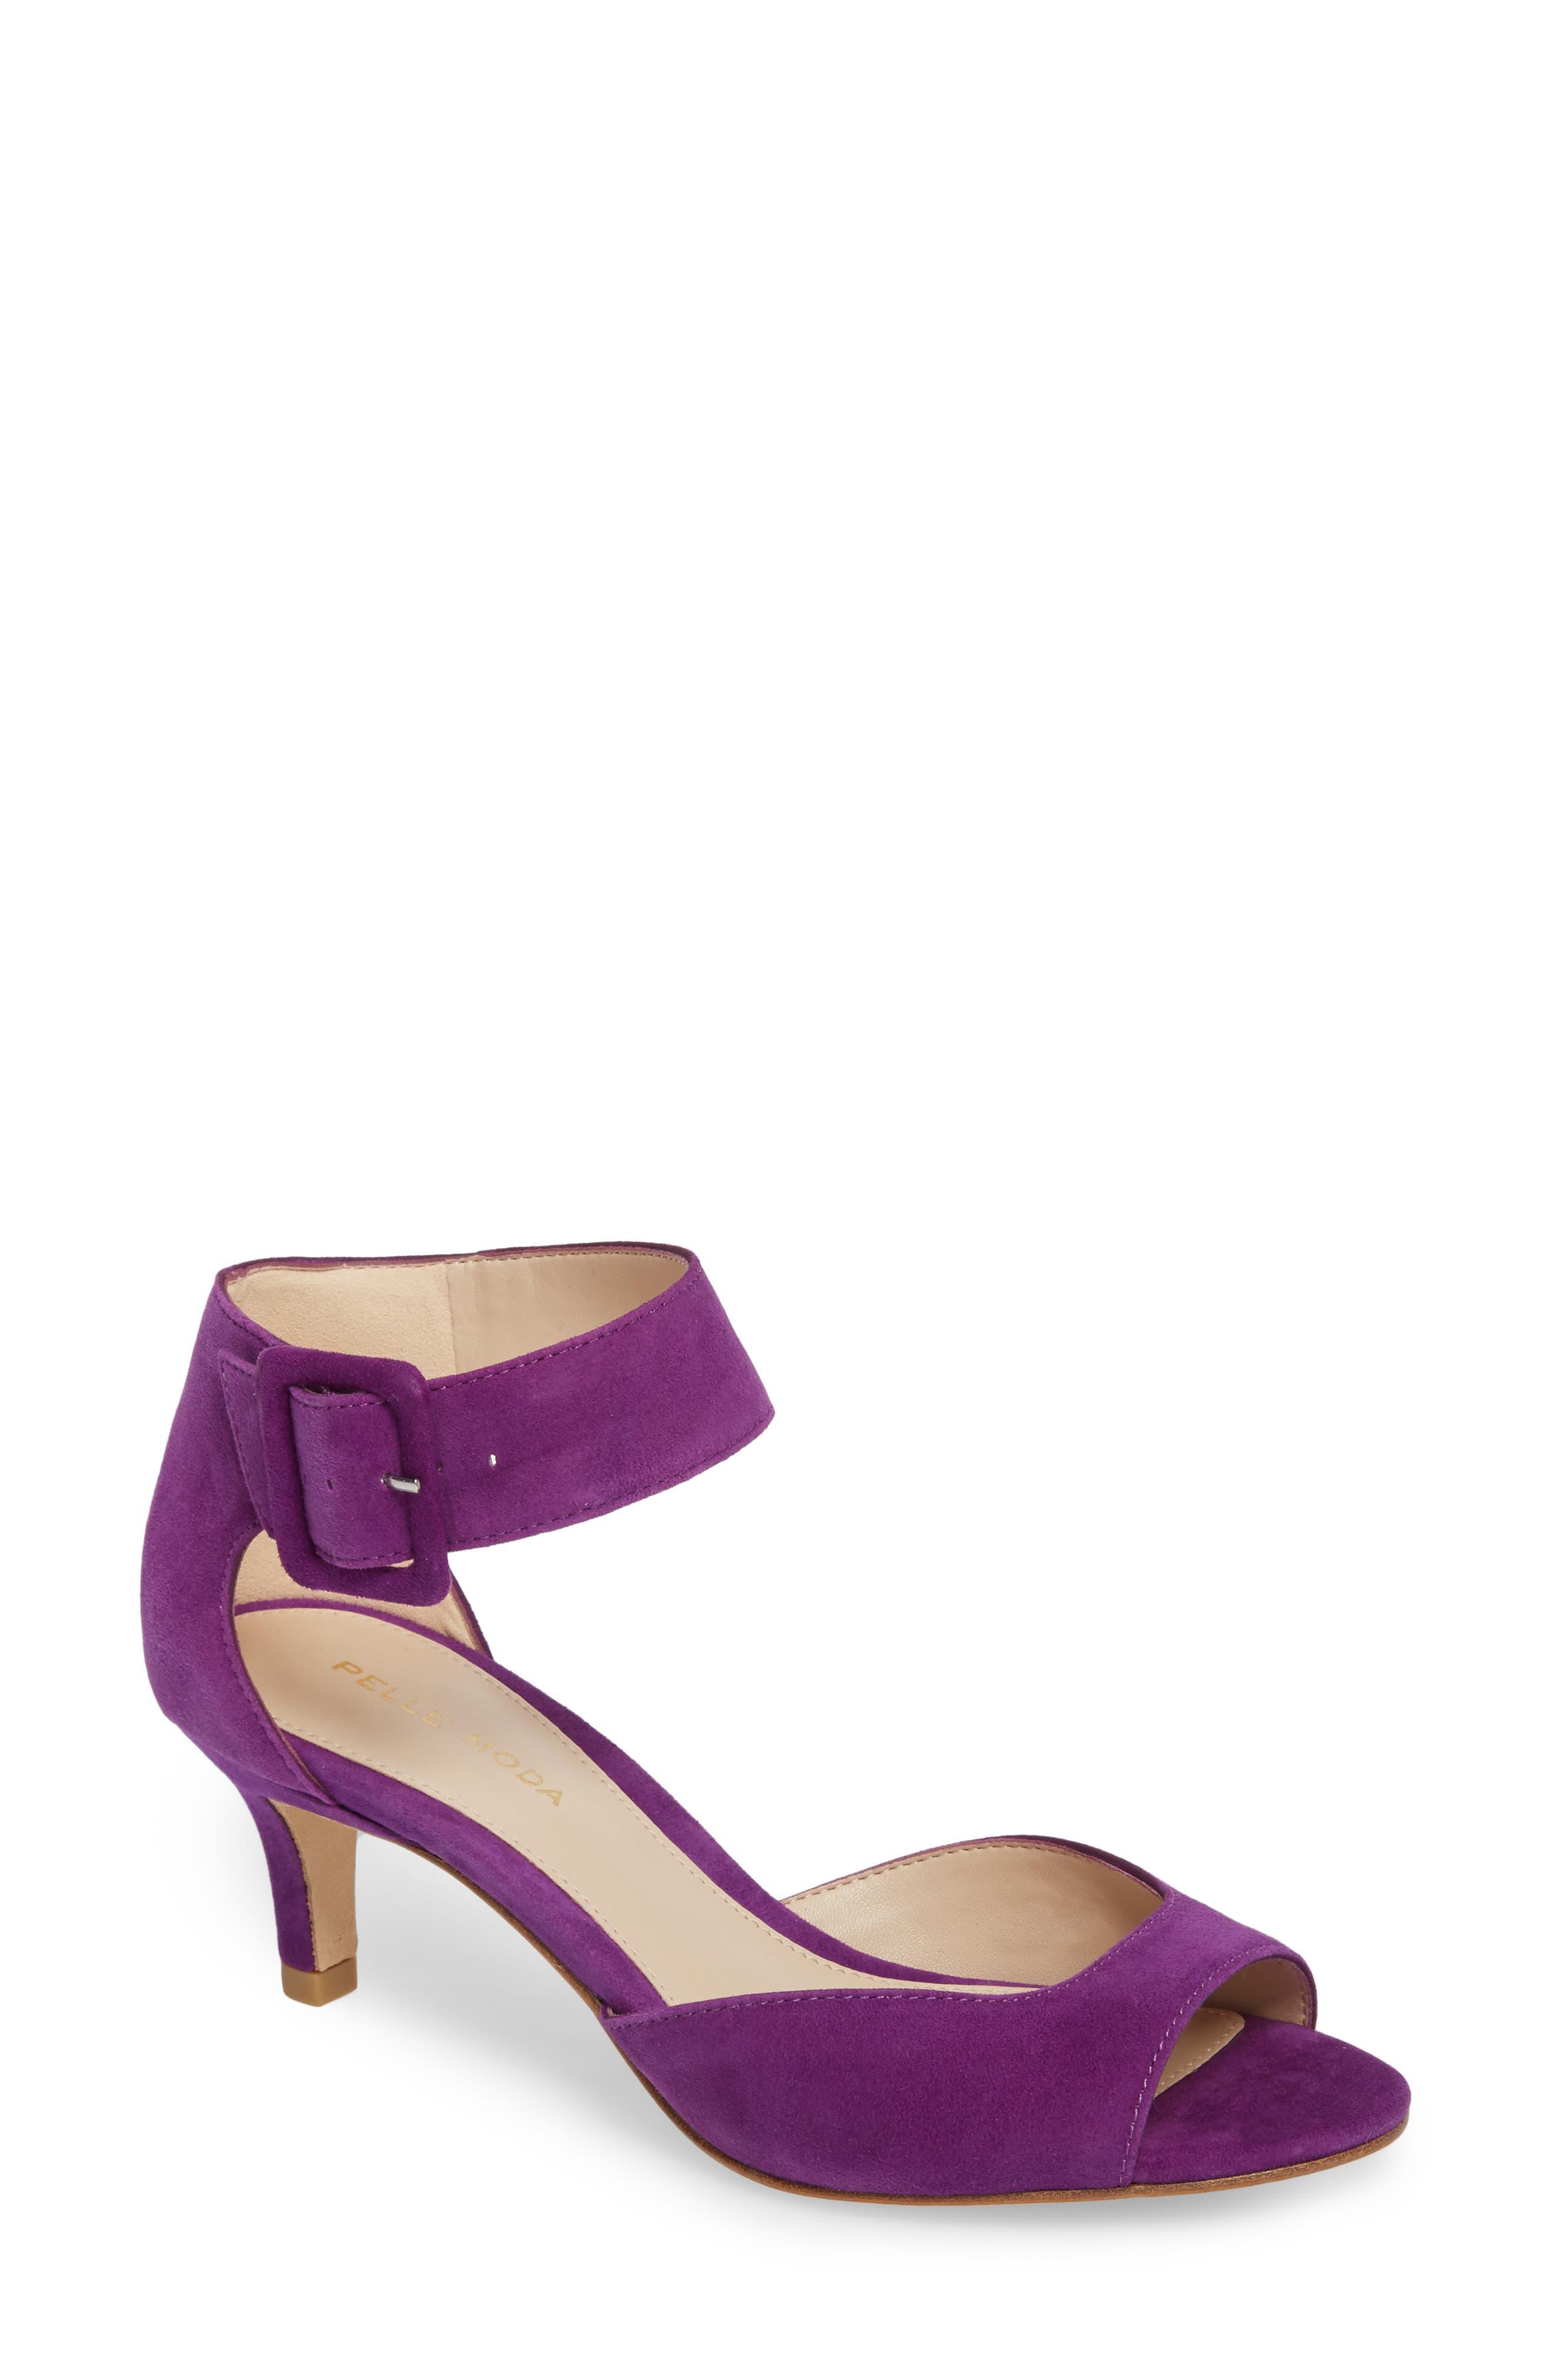 'Berlin' Ankle Strap Sandal,                             Main thumbnail 4, color,